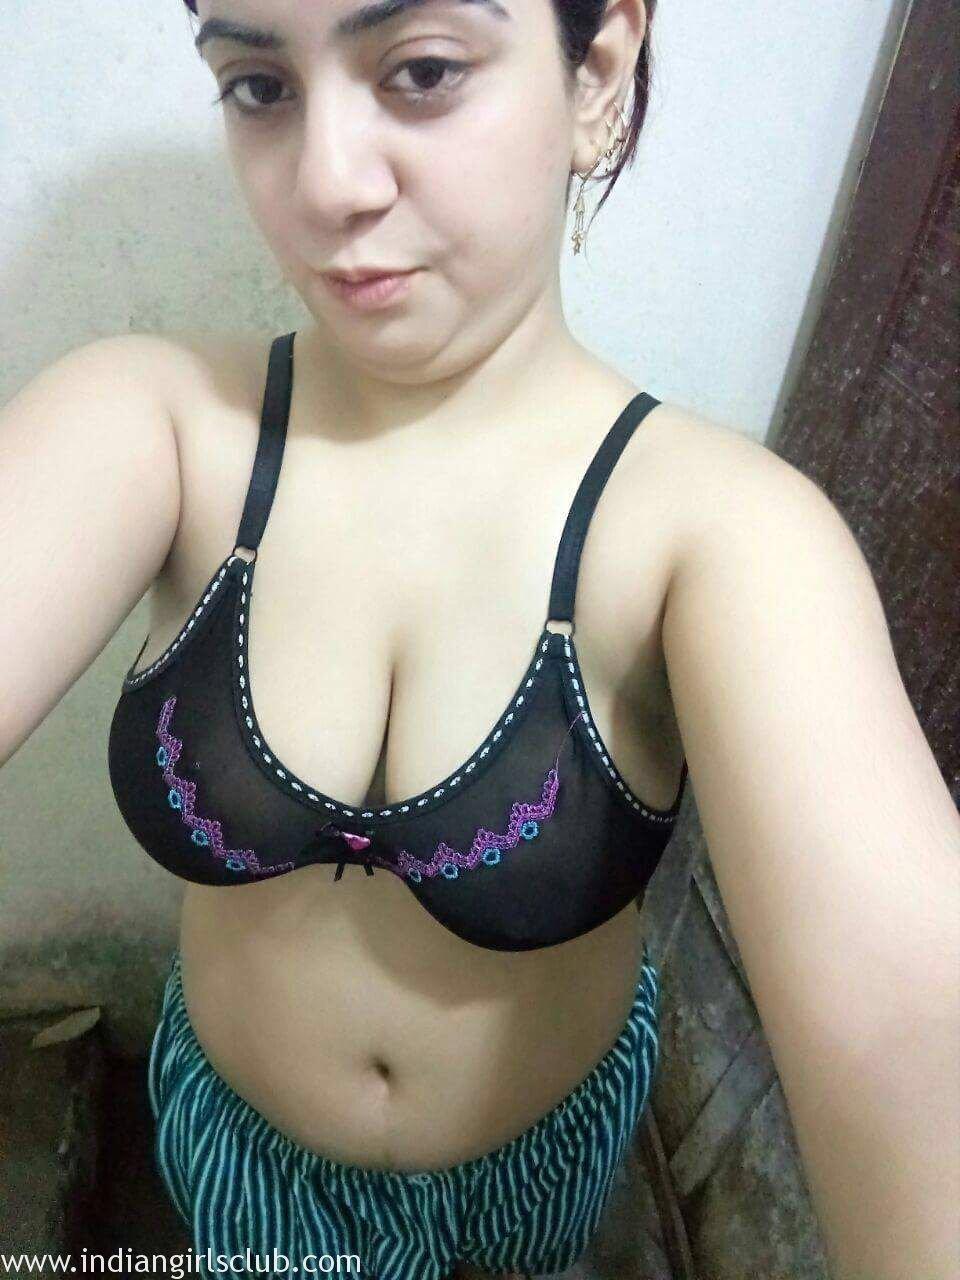 pakistani porn girls pics